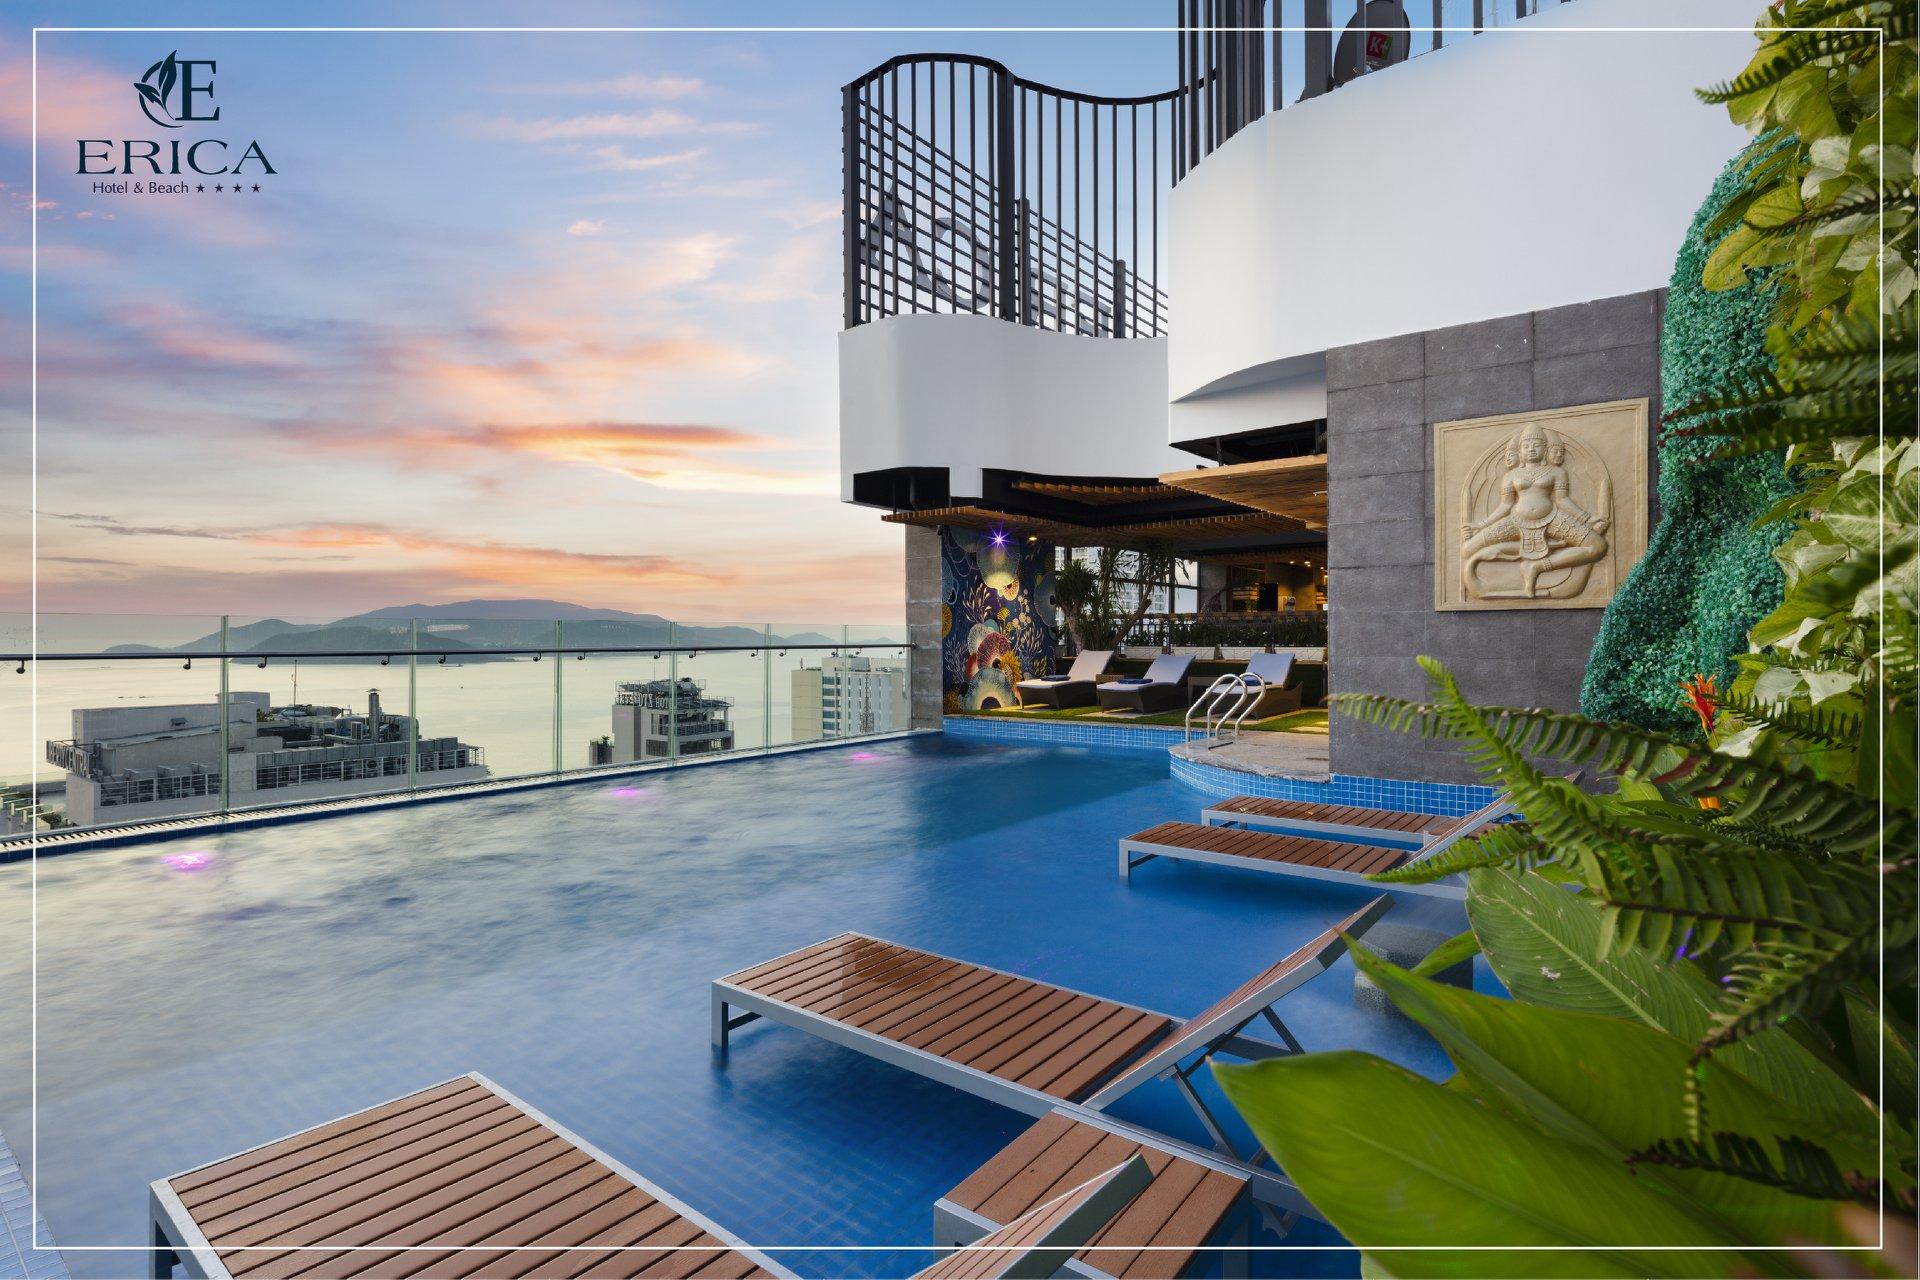 Hà Nội – Nha Trang tại Erica Hotel & Beach tiêu chuẩn 4 sao